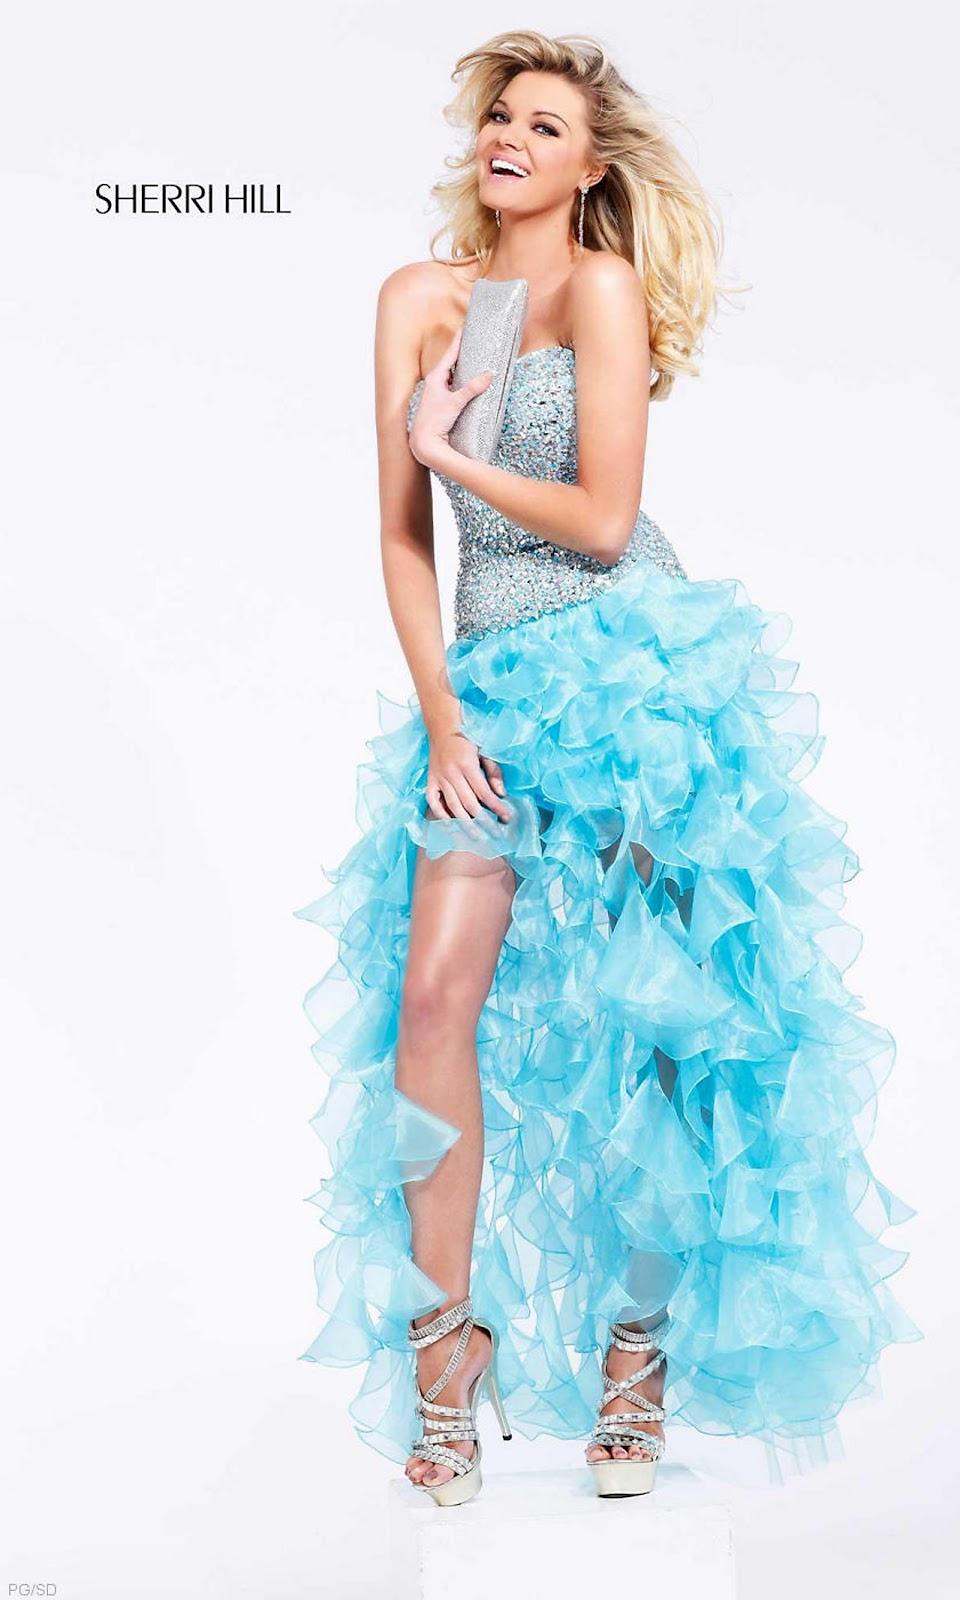 loreleibraut-wedding dresses 2013 news,vintage prom dresses 2012 ...